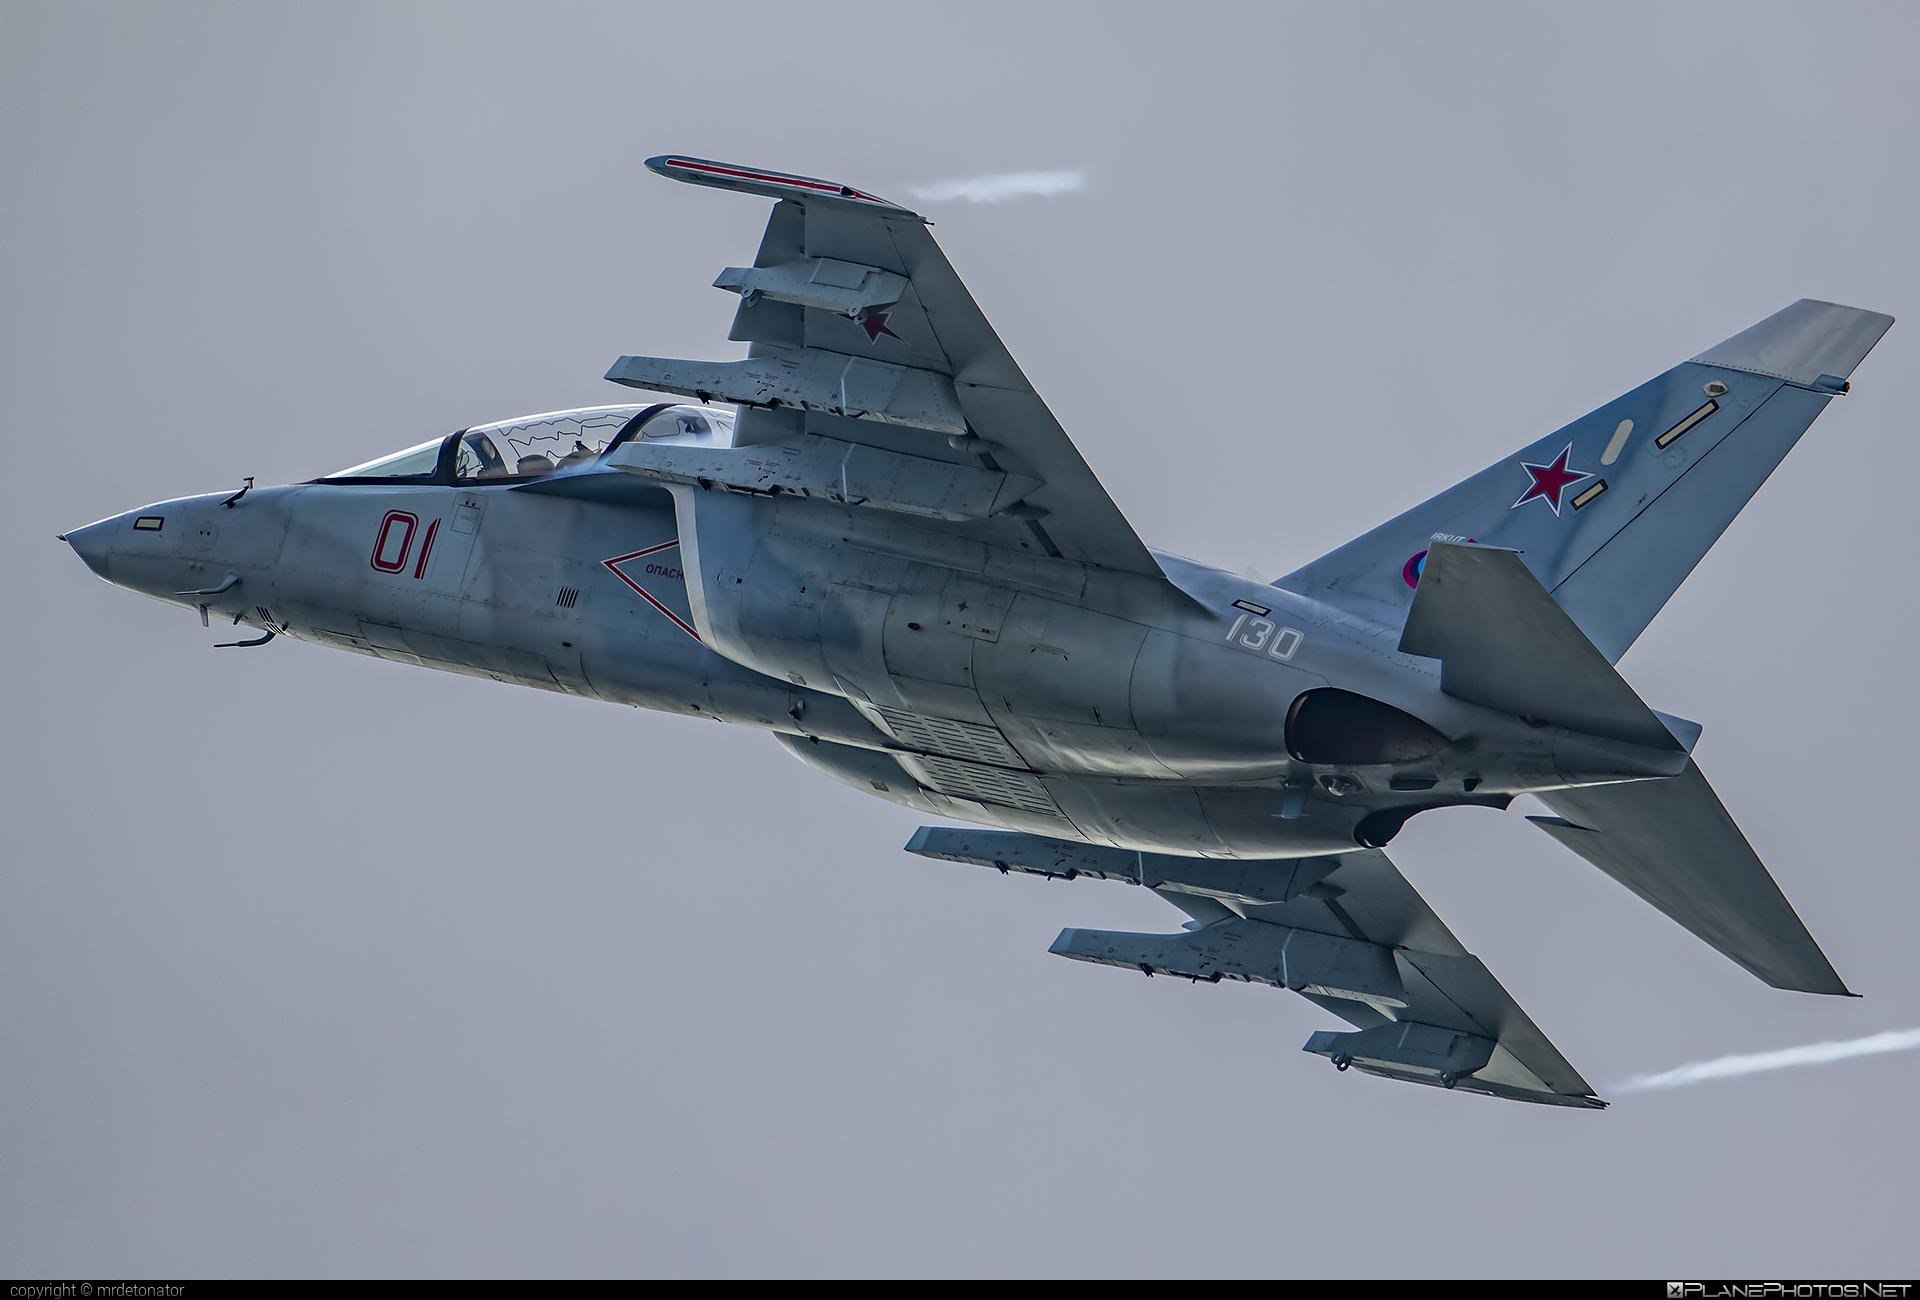 Yakovlev Yak-130 - 01 operated by Yakovlev Design Bureau #yak #yak130 #yakovlev